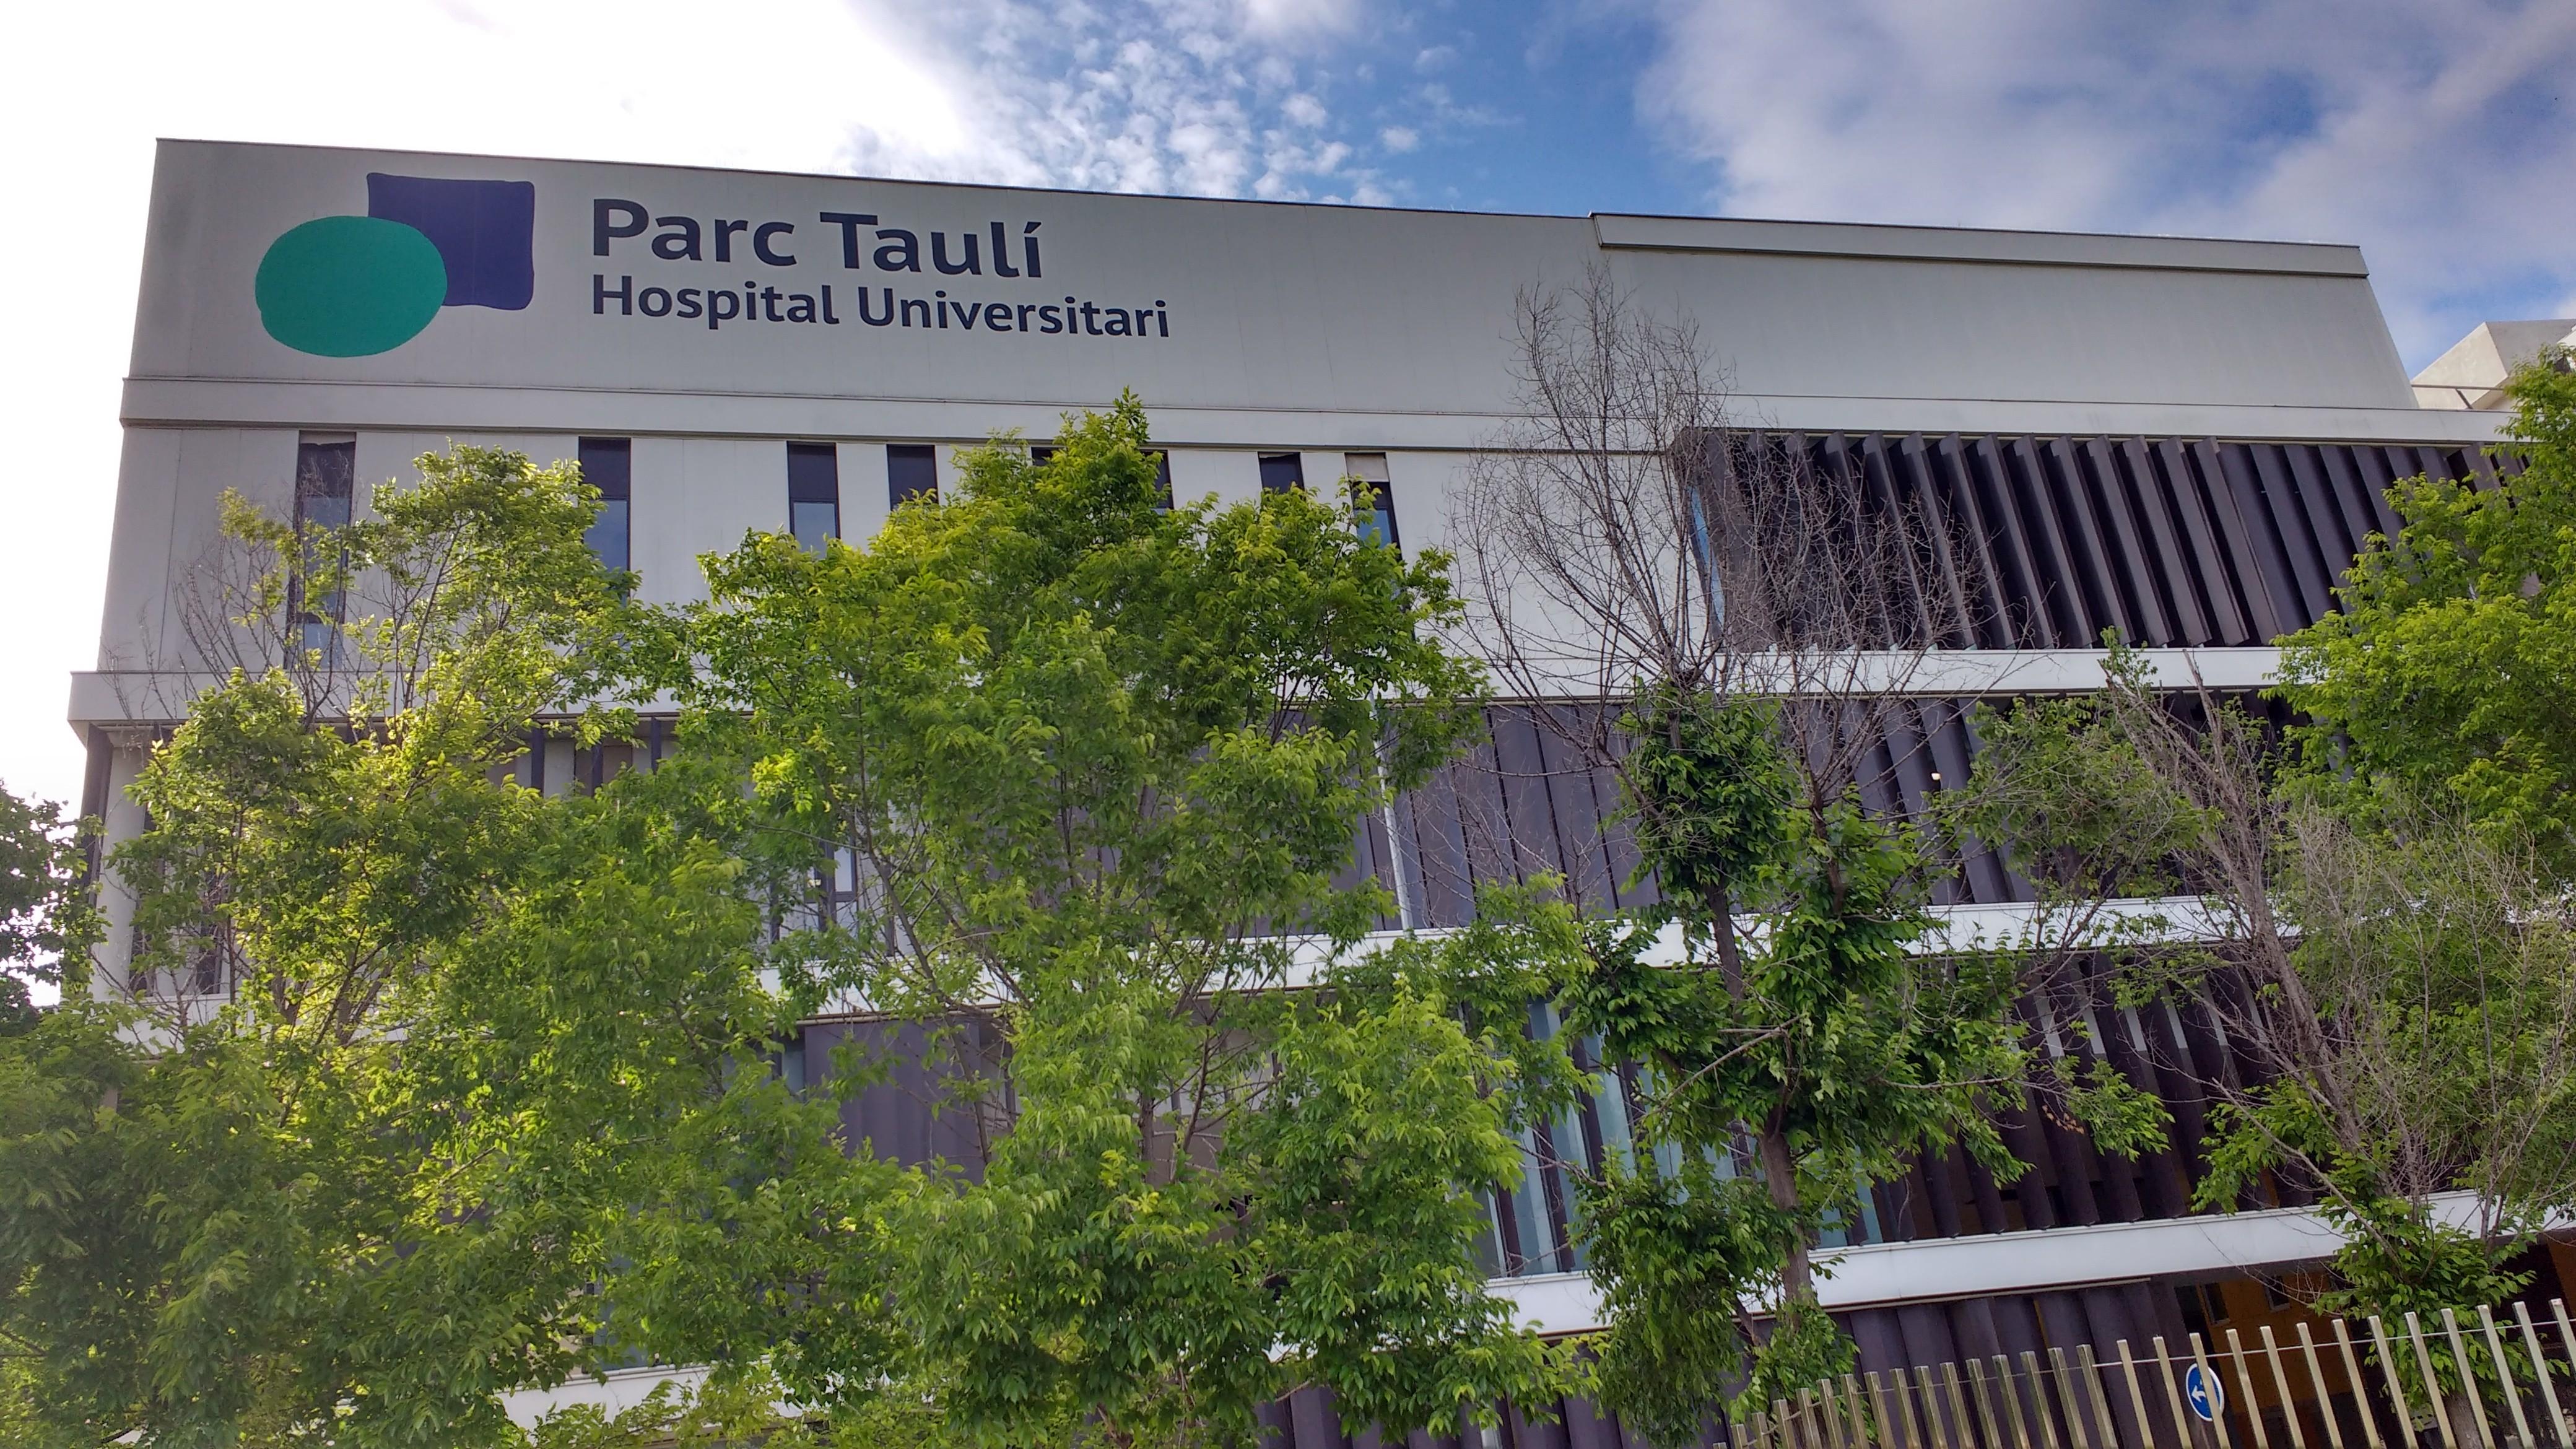 HospitalUniversitariParcTauli